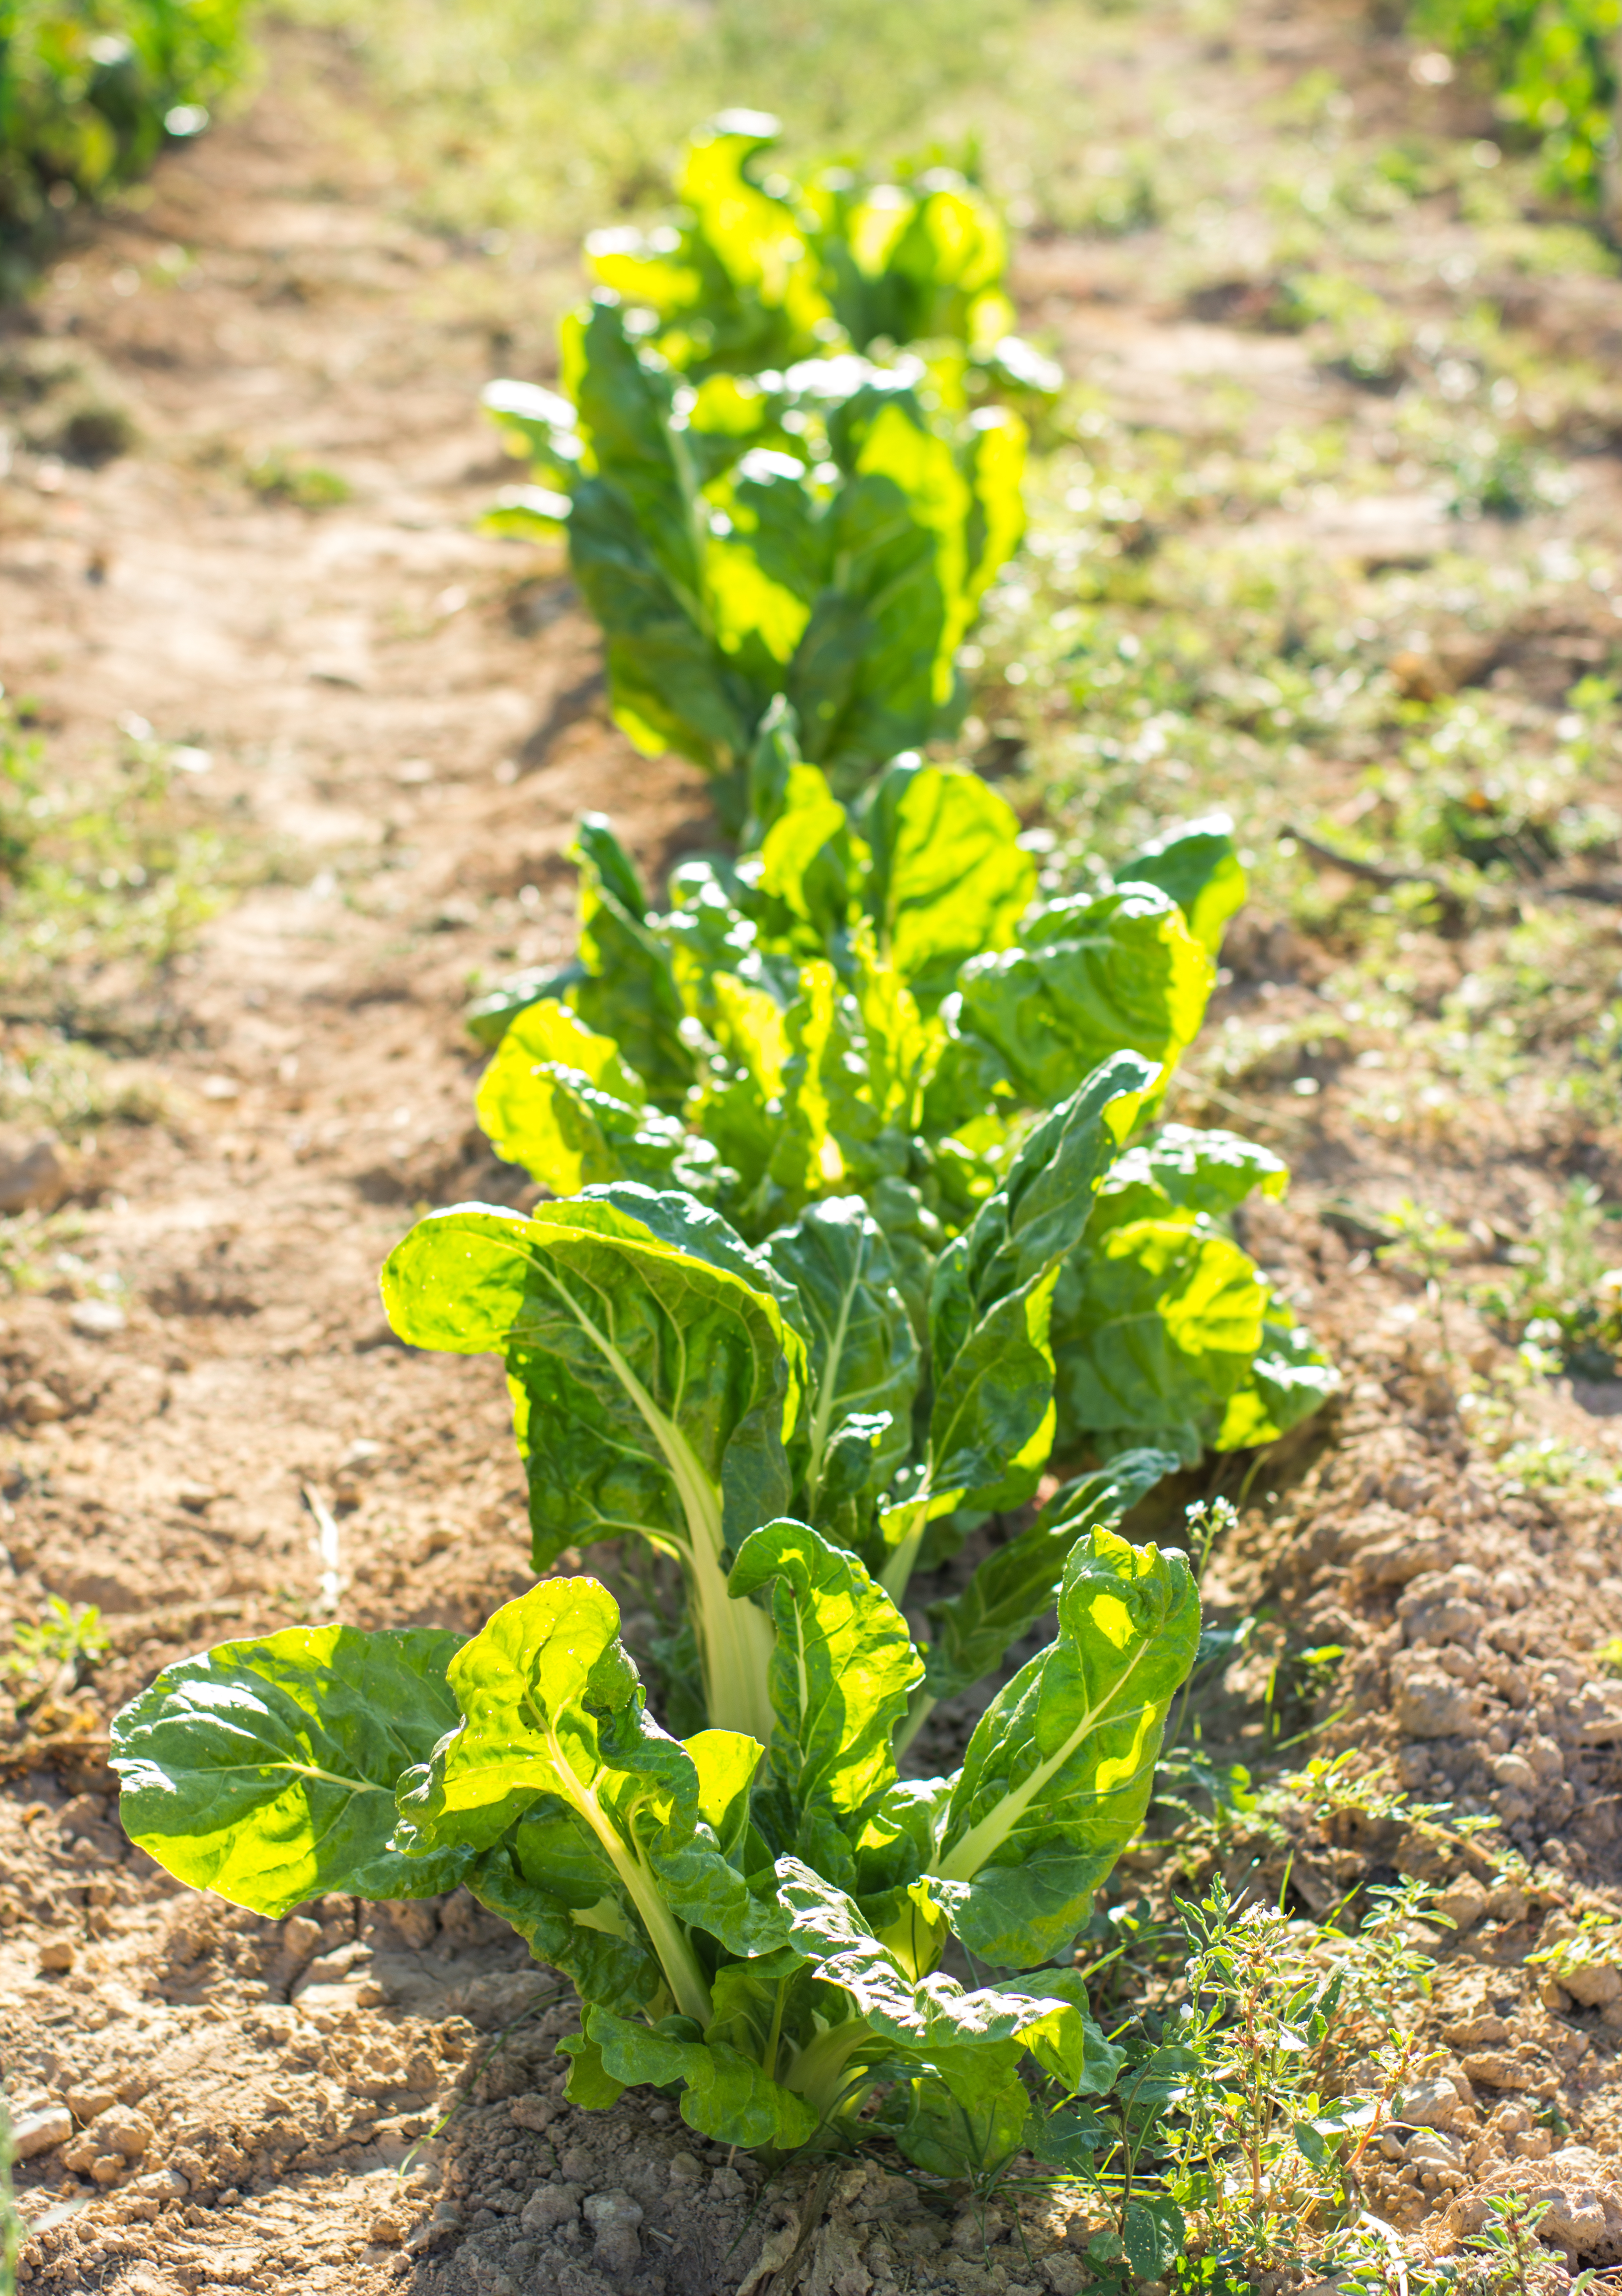 chard planted